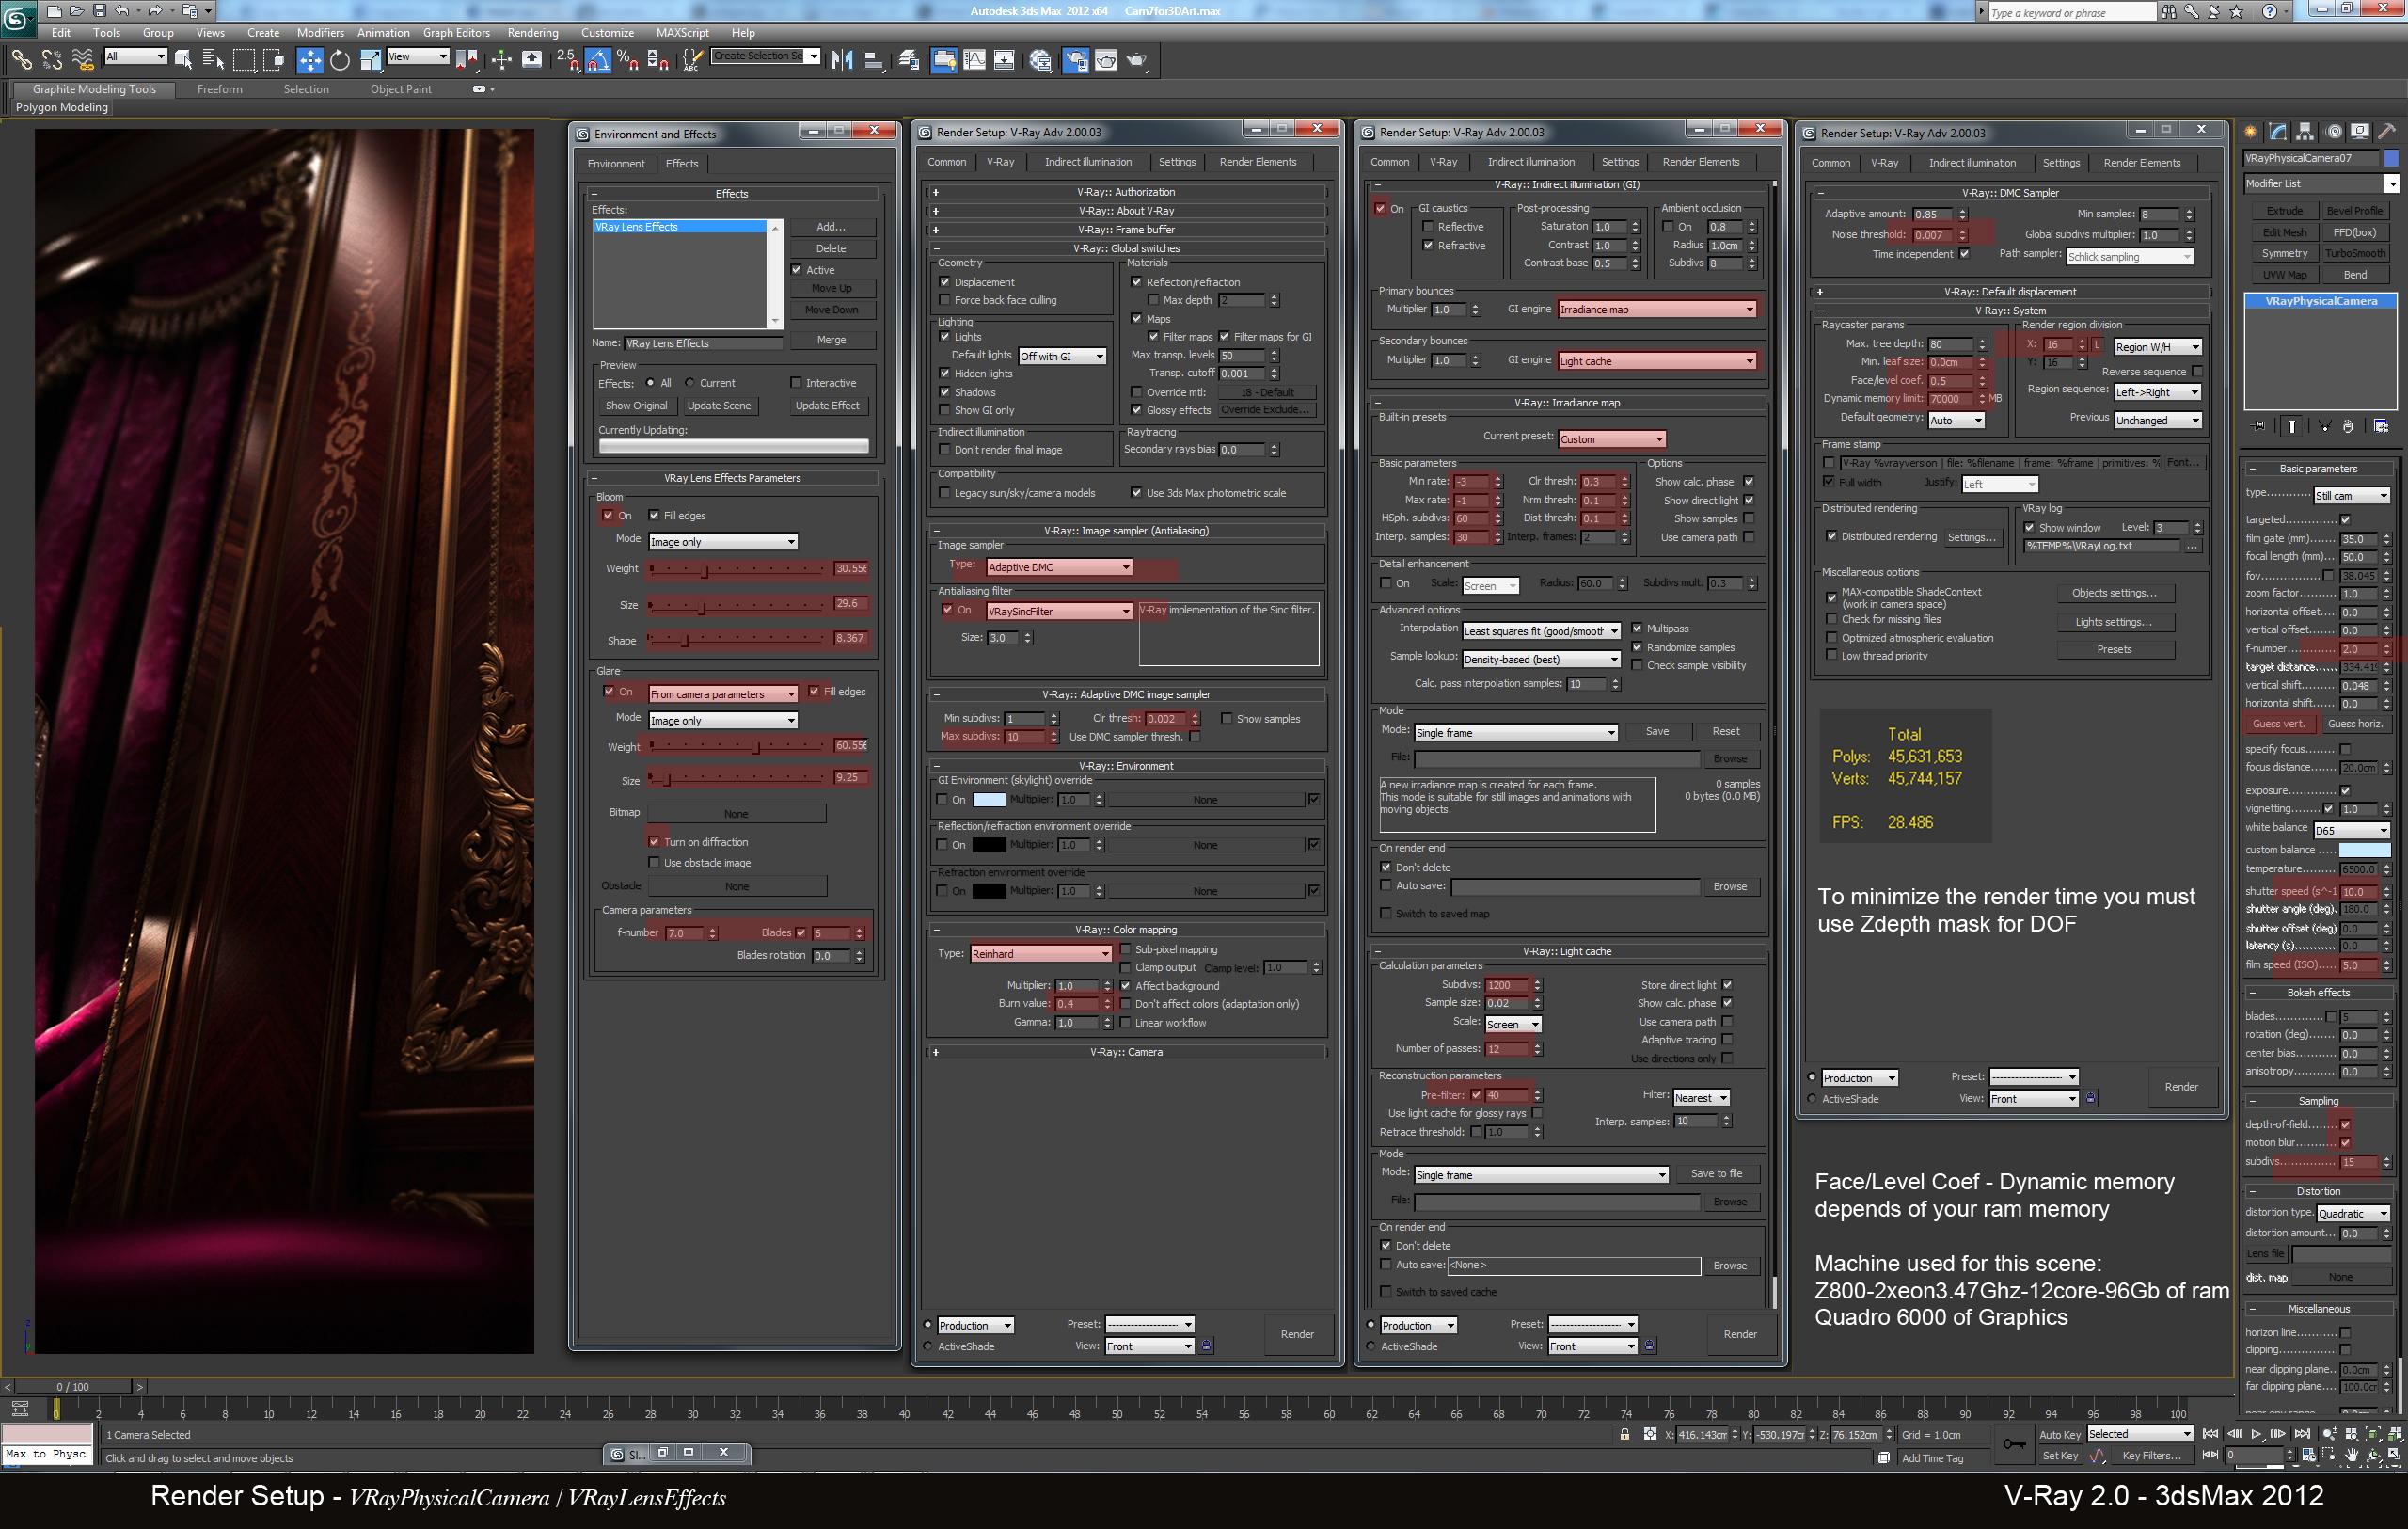 Render_Setup.jpg